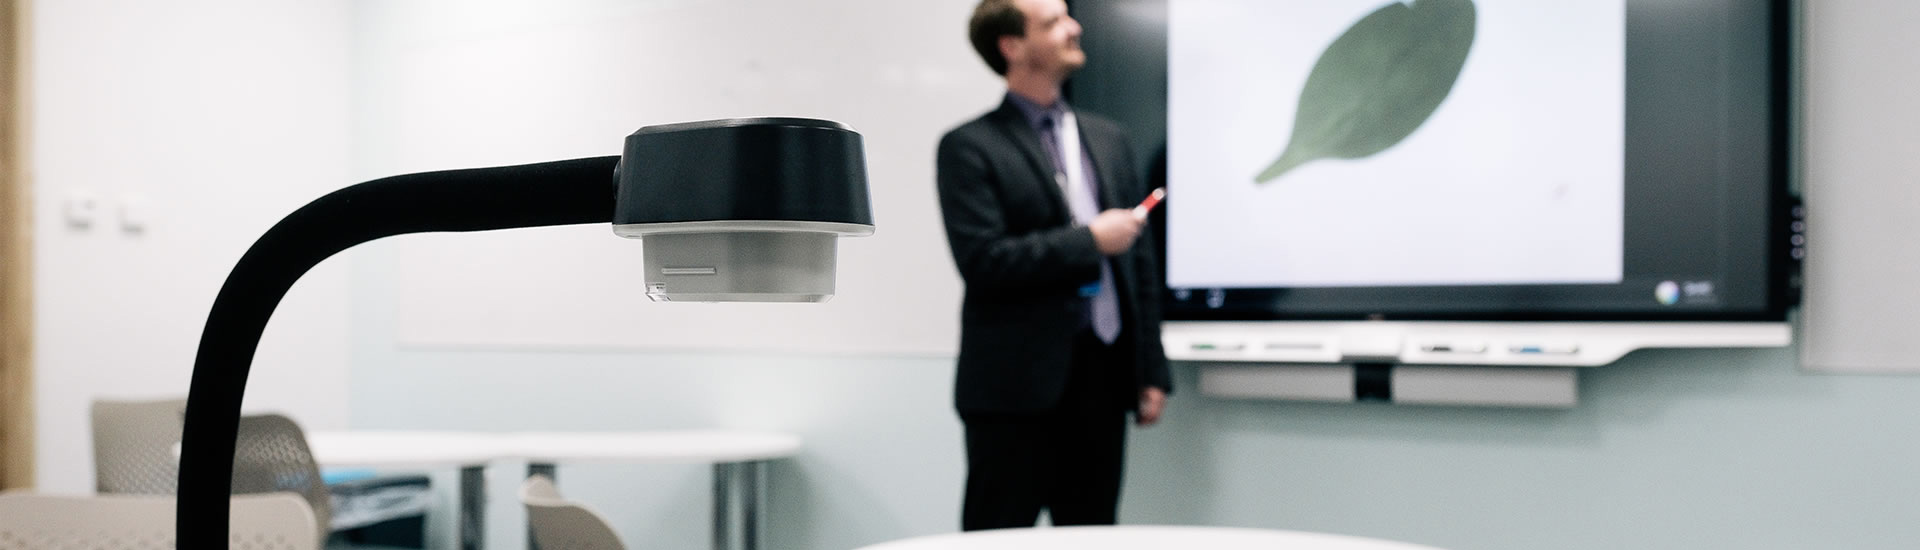 SMART Dokumentkamera Smarttechnologies